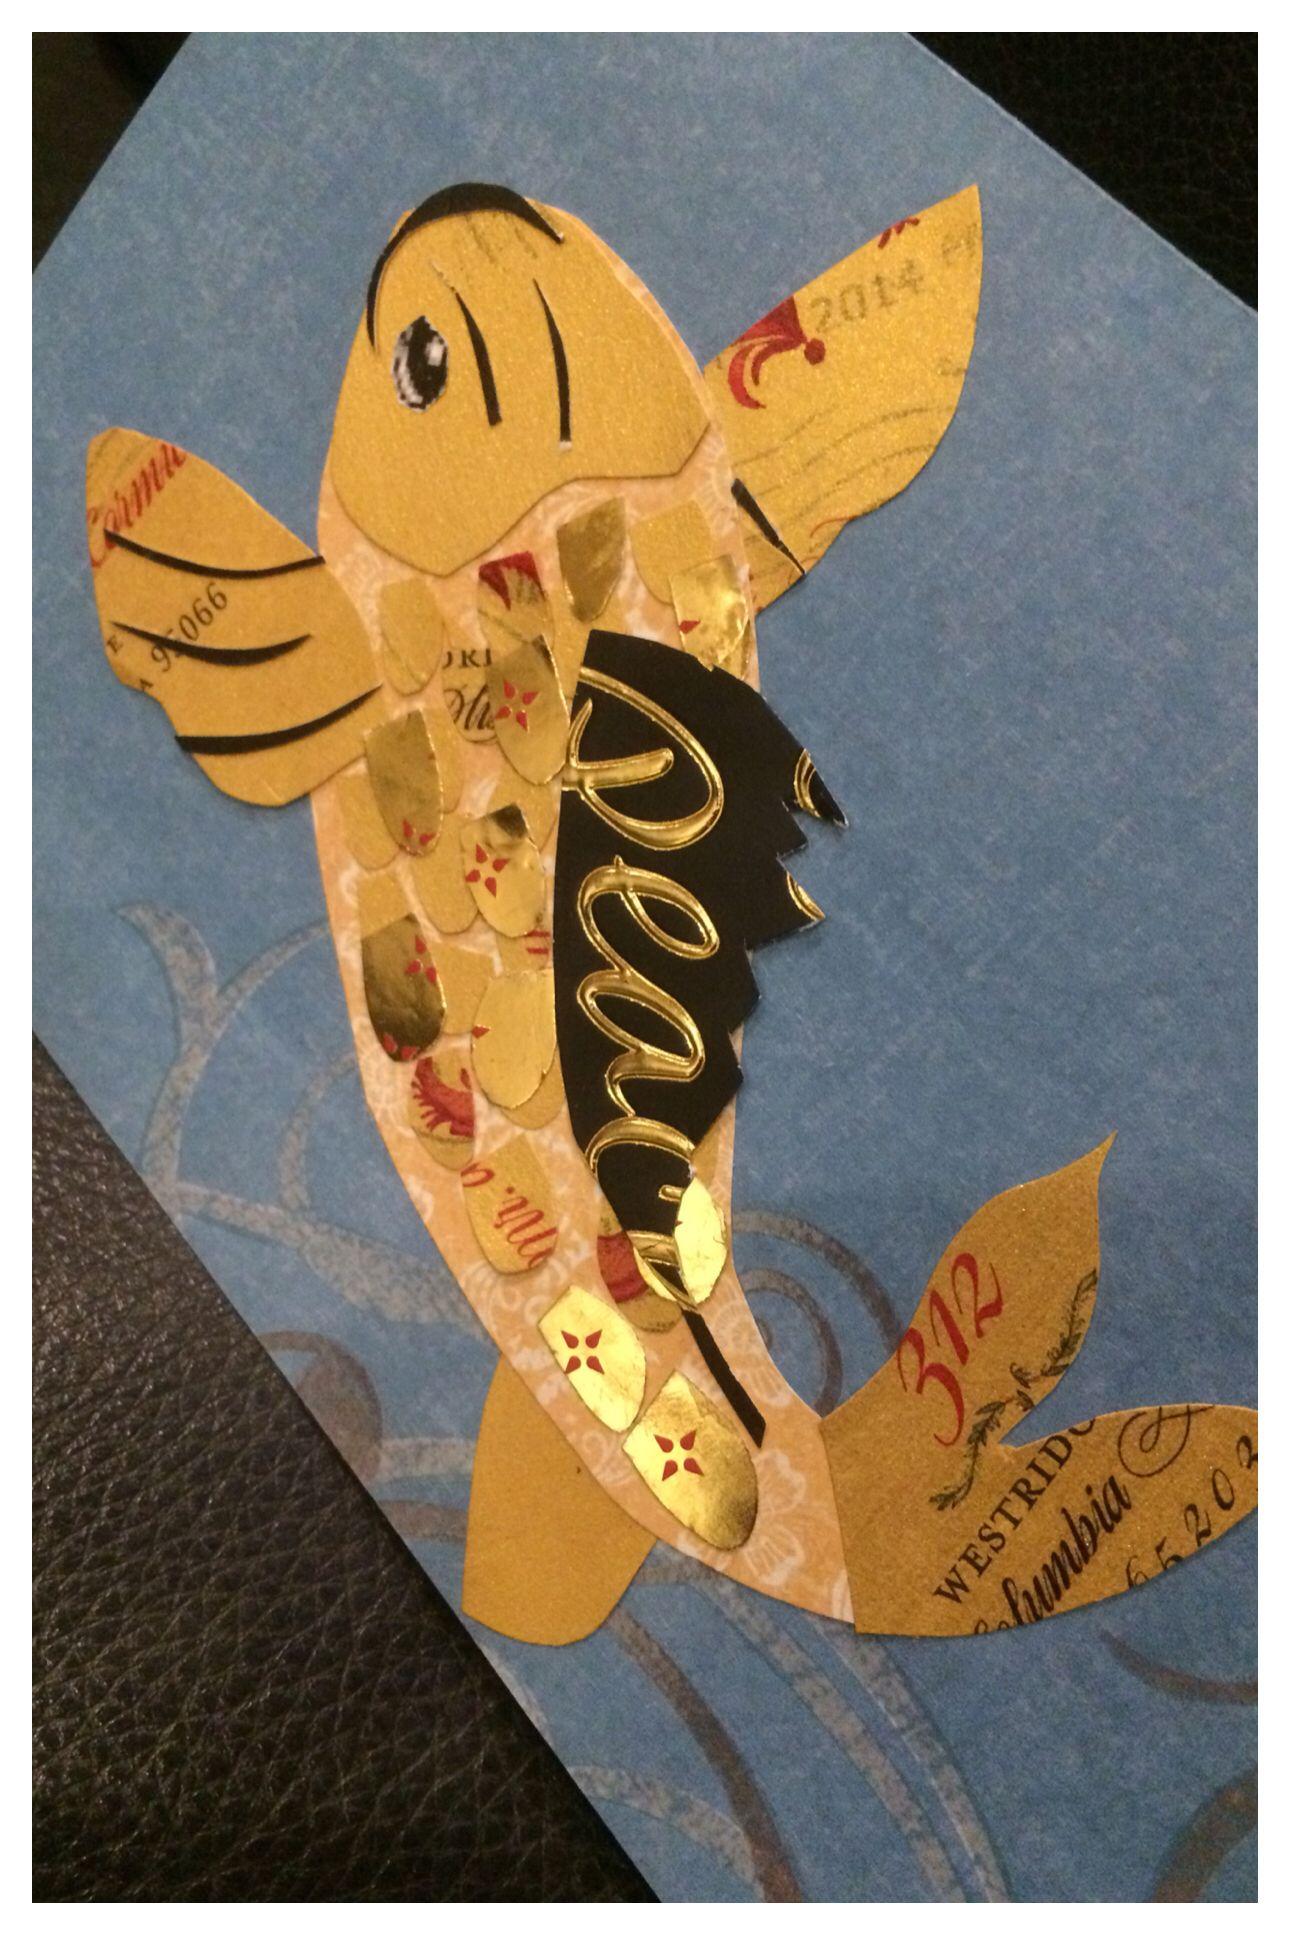 Koi Thank You Cards Handmade Love Cards Cards